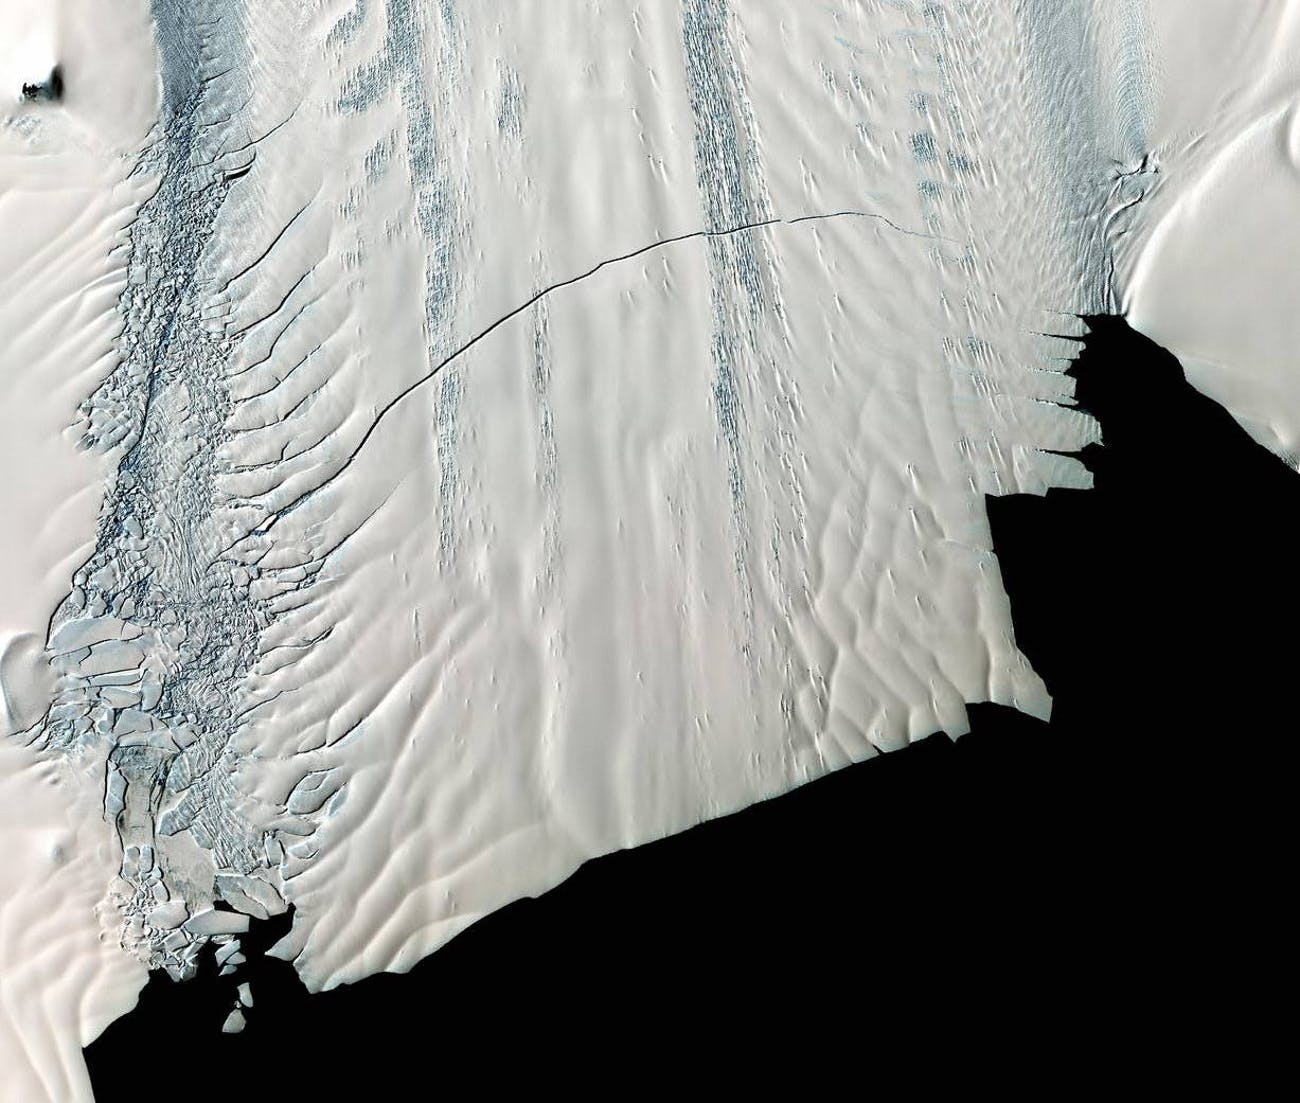 pine island glacier crack